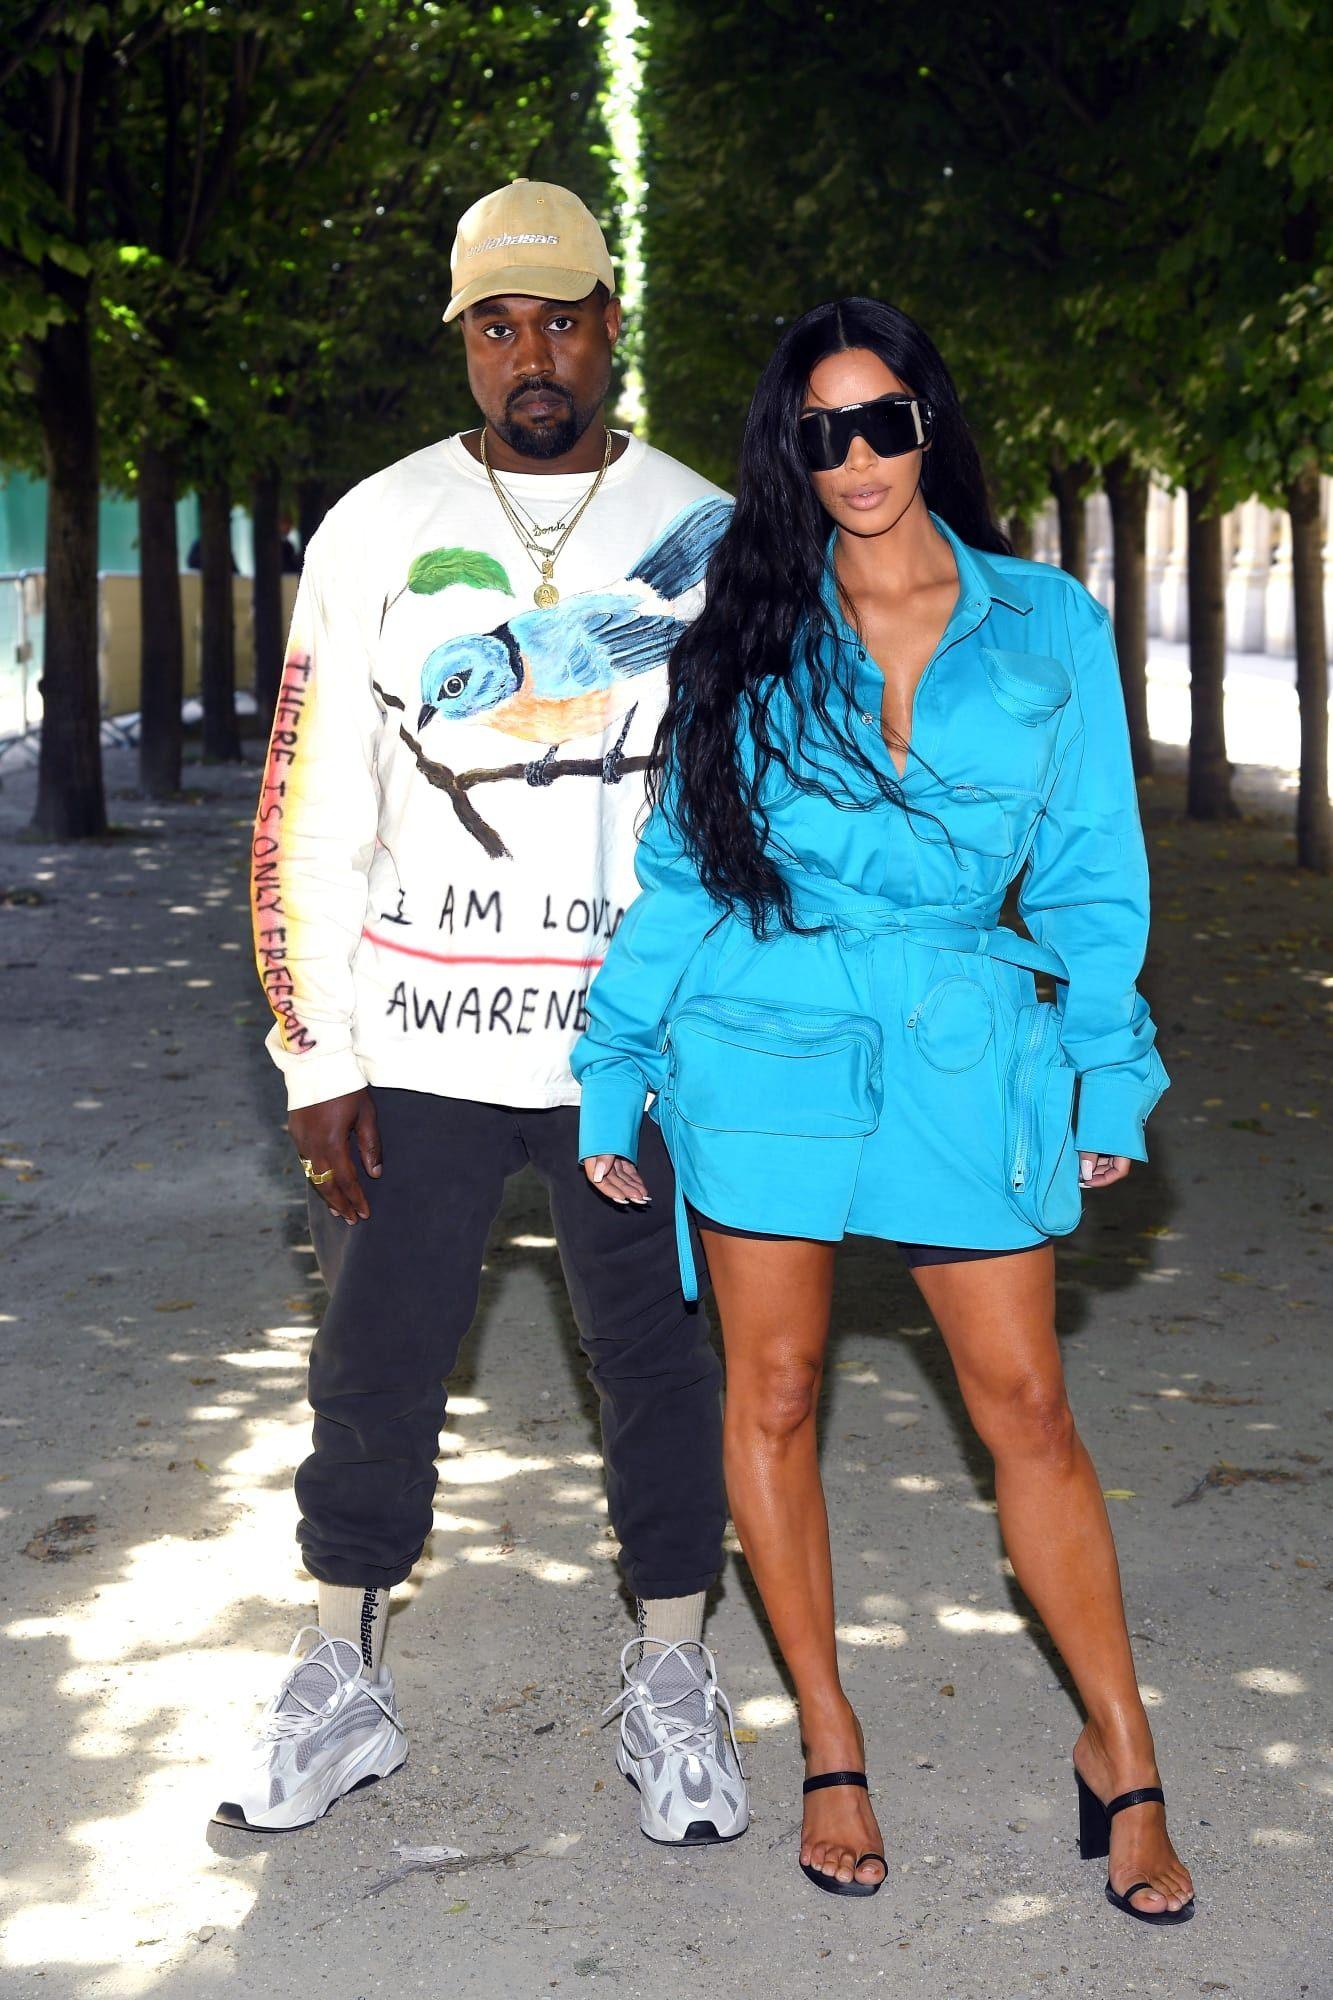 Kim Kardashian and Kanye West at Louis Vuitton s Spring 2019 menswear show.   KimKardashian  KanyeWest  LouisVuitton a3a5ebad3